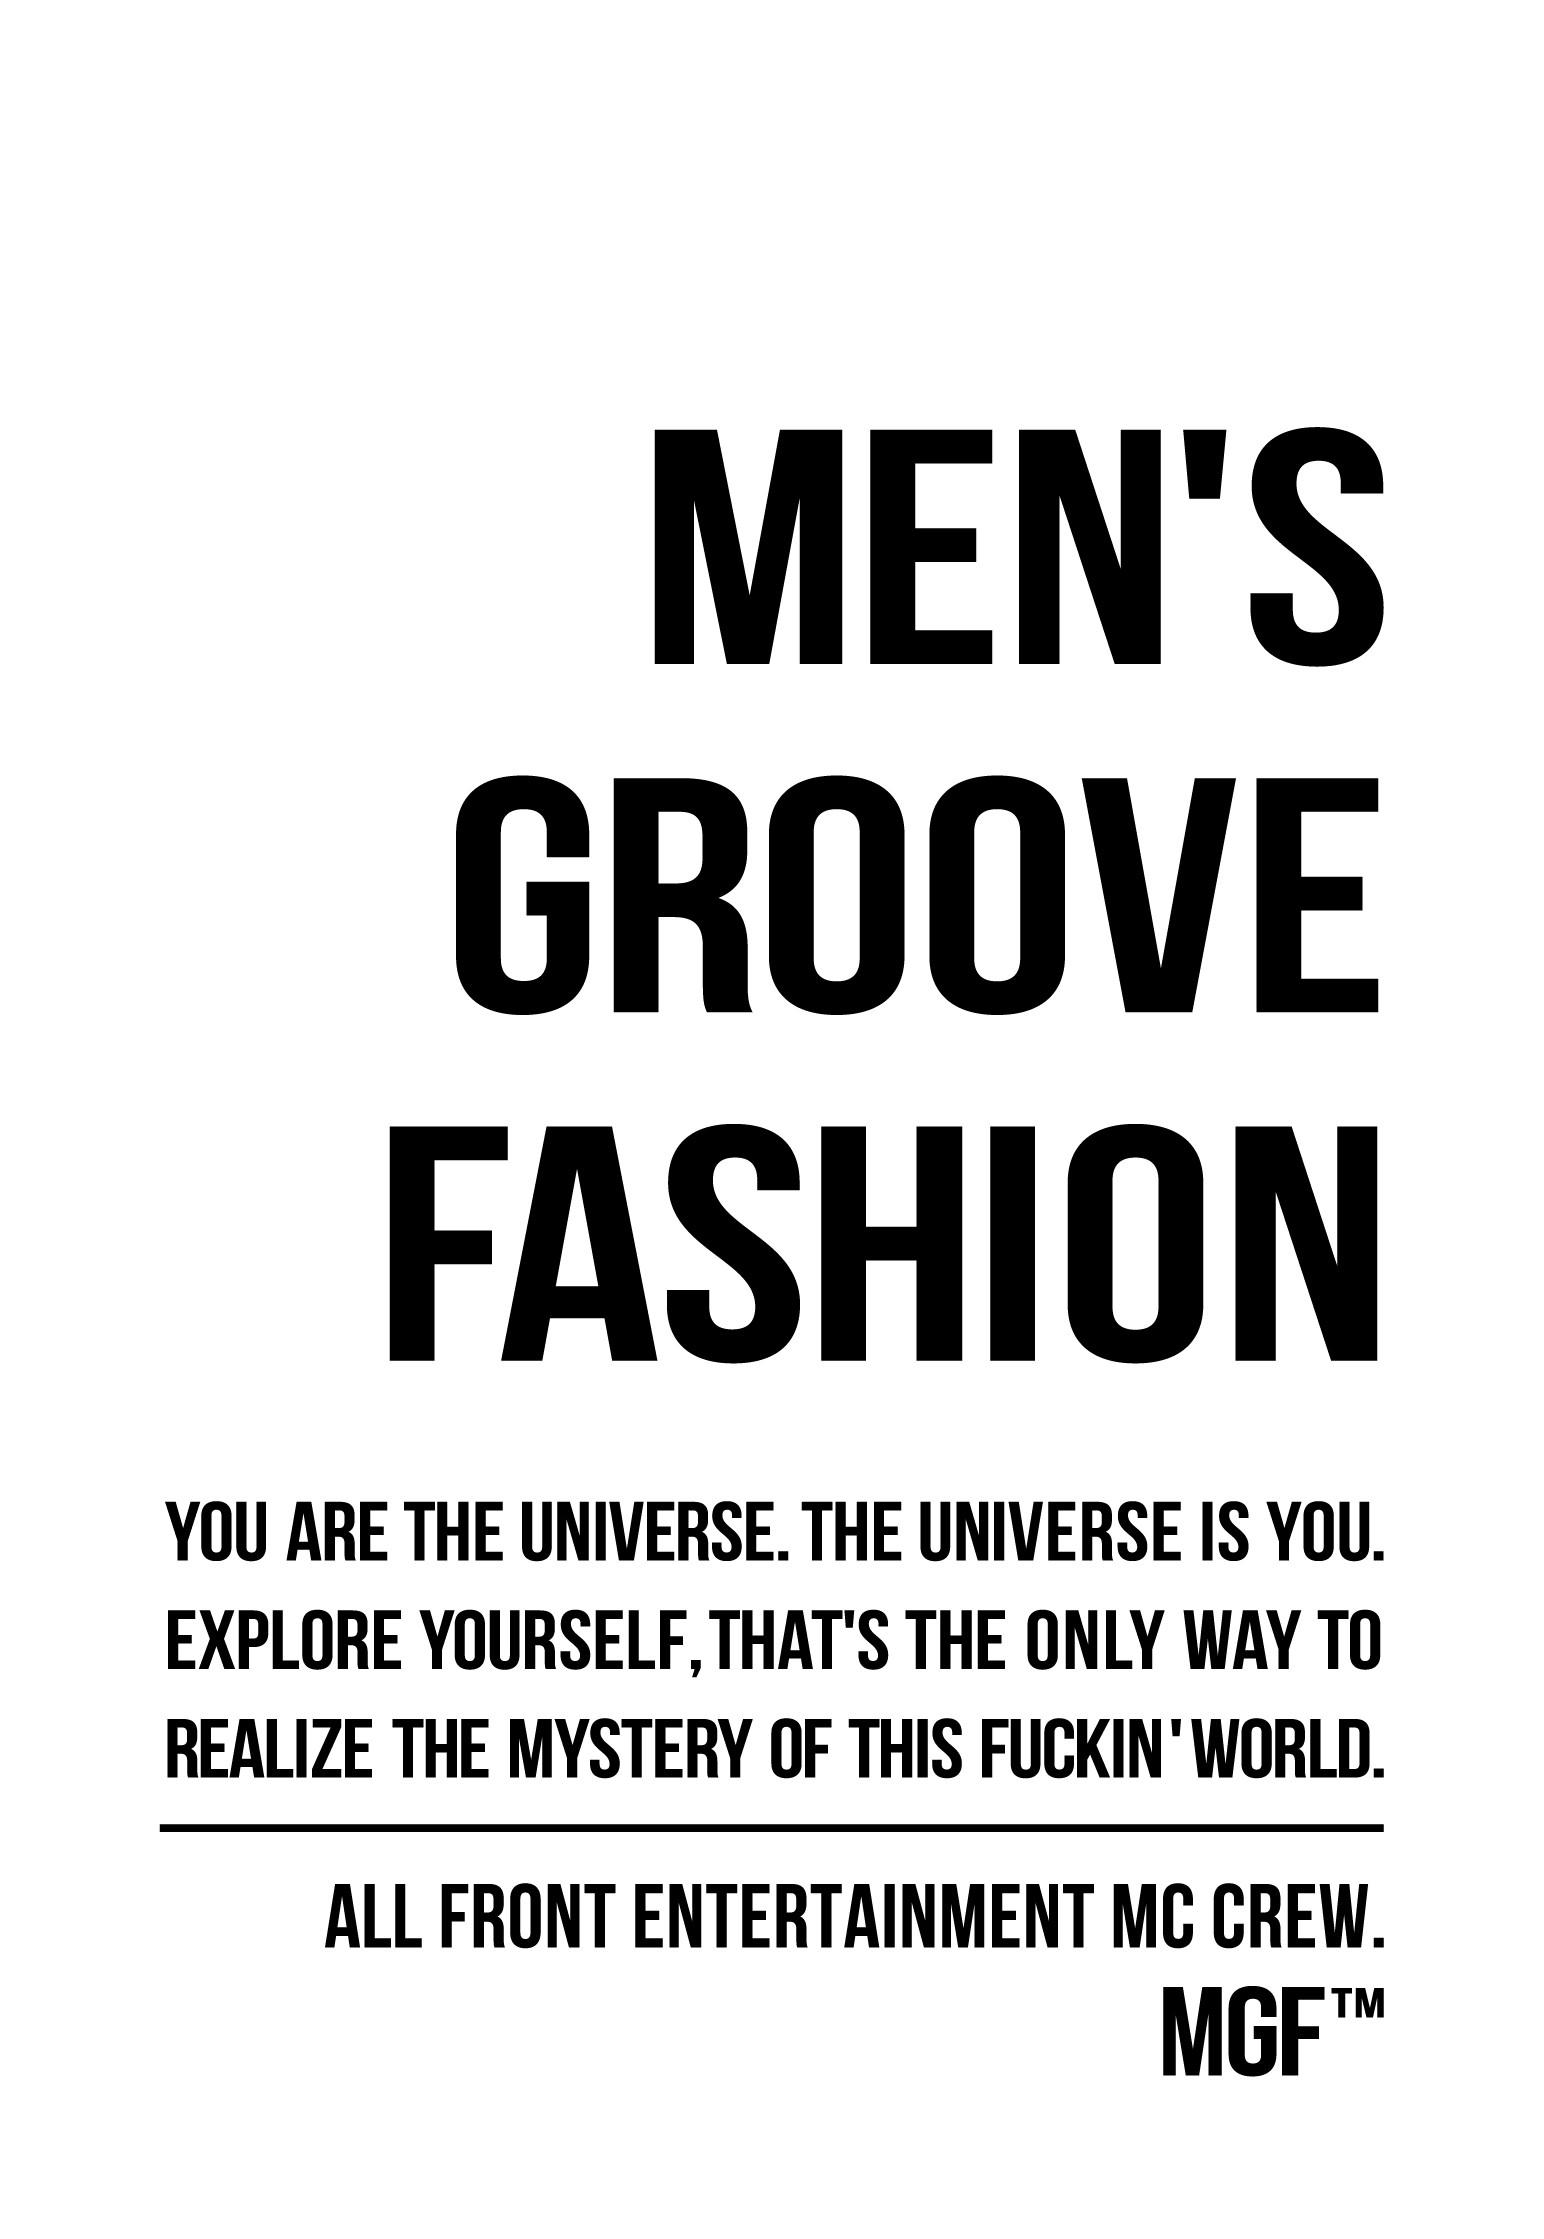 MEN'S GROOVE FASHION